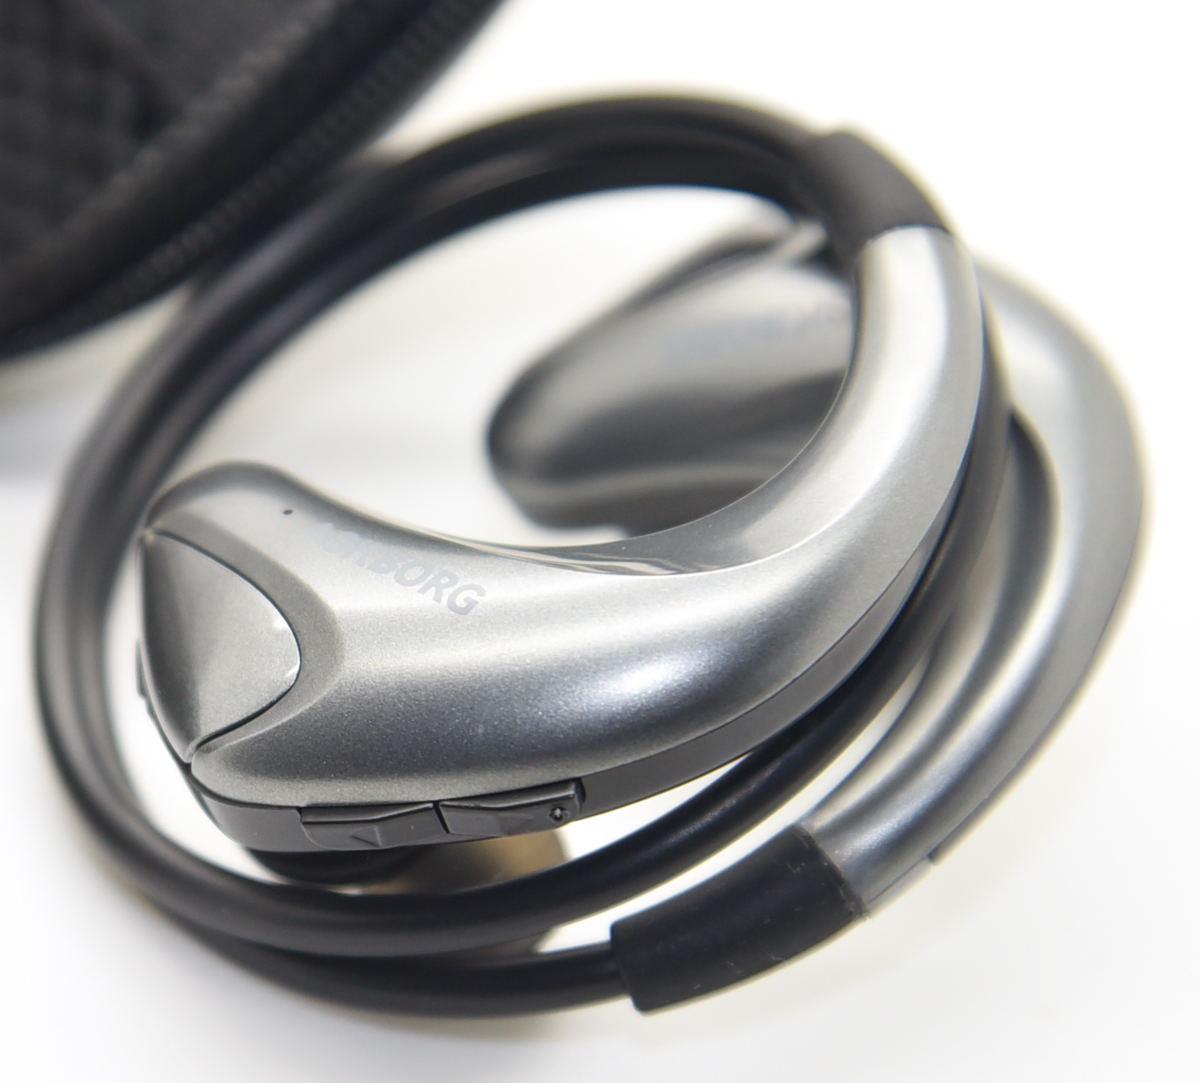 Askborg ExerSound kabellose Ohrhörer